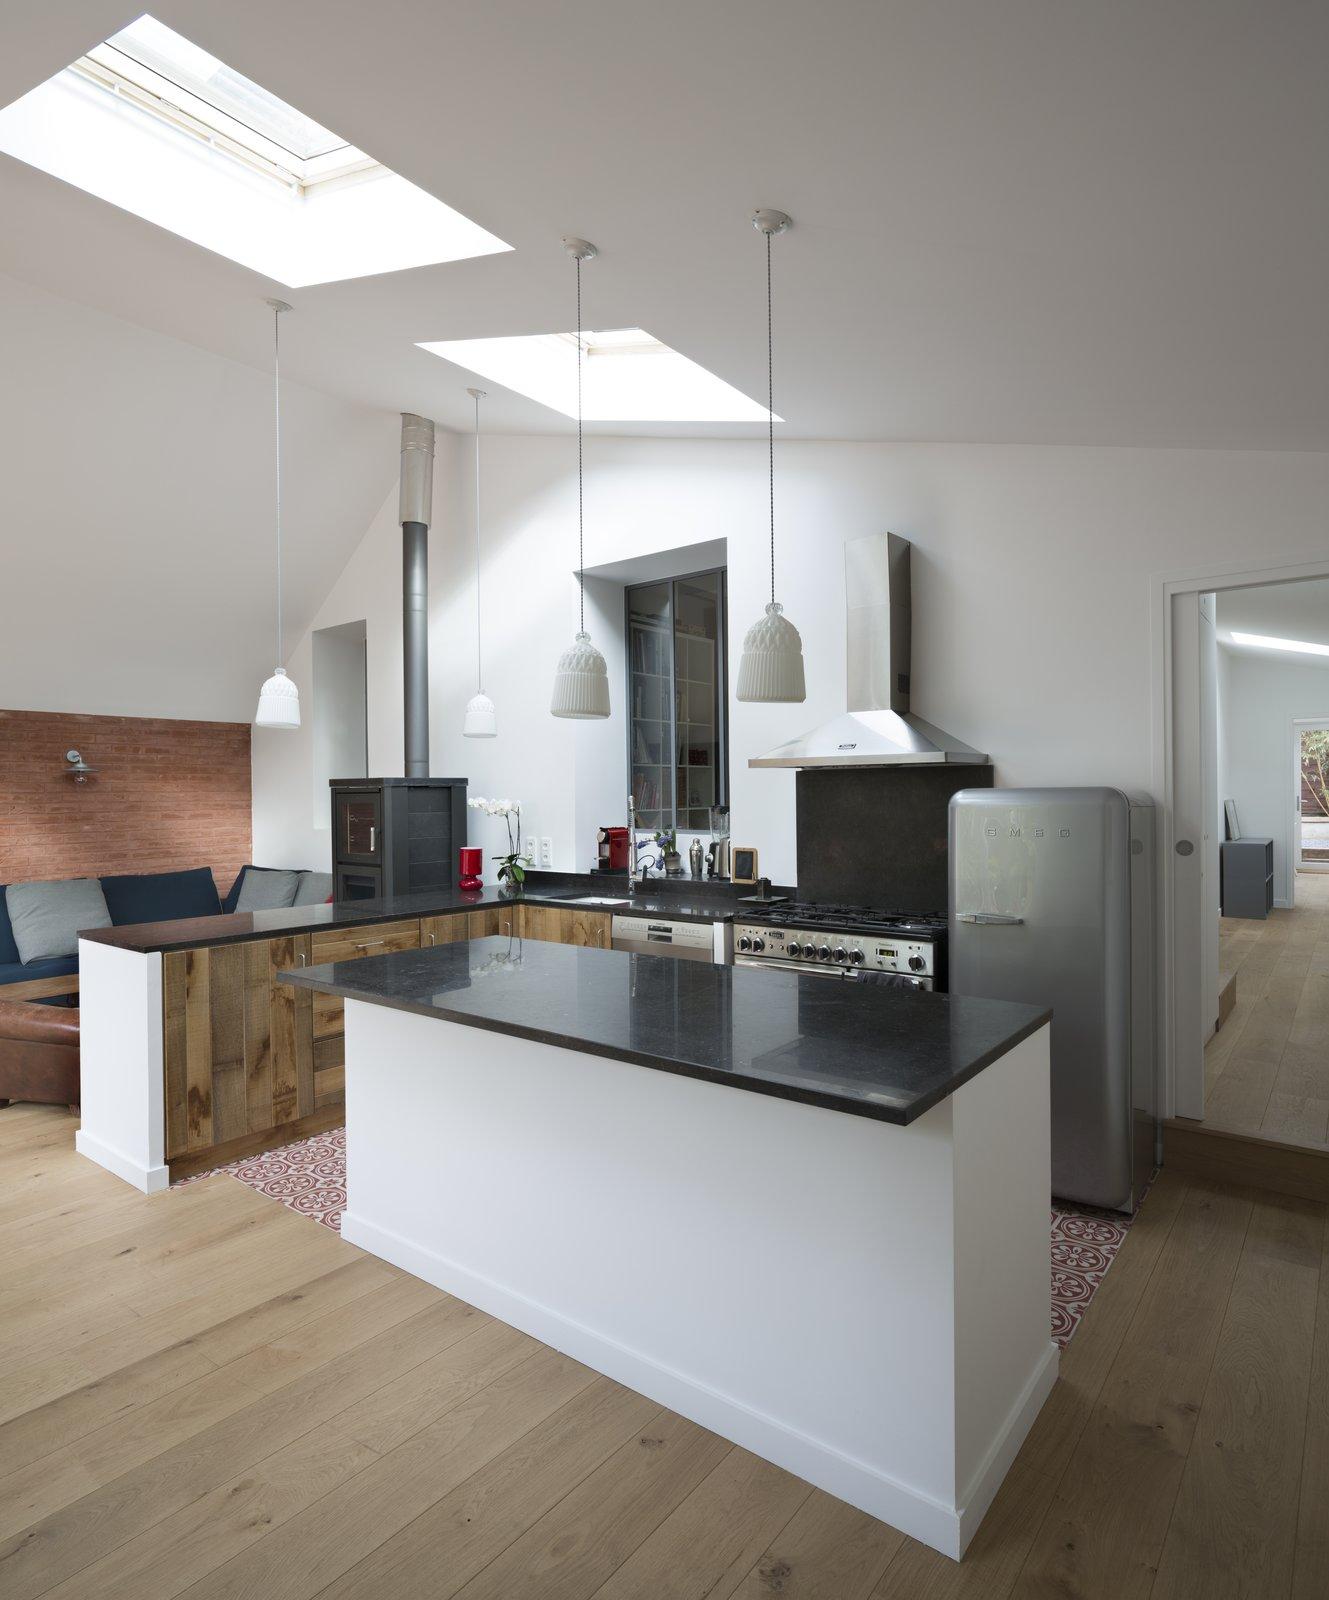 The kitchen features countertops from Pierre Bleue de Hainaut.